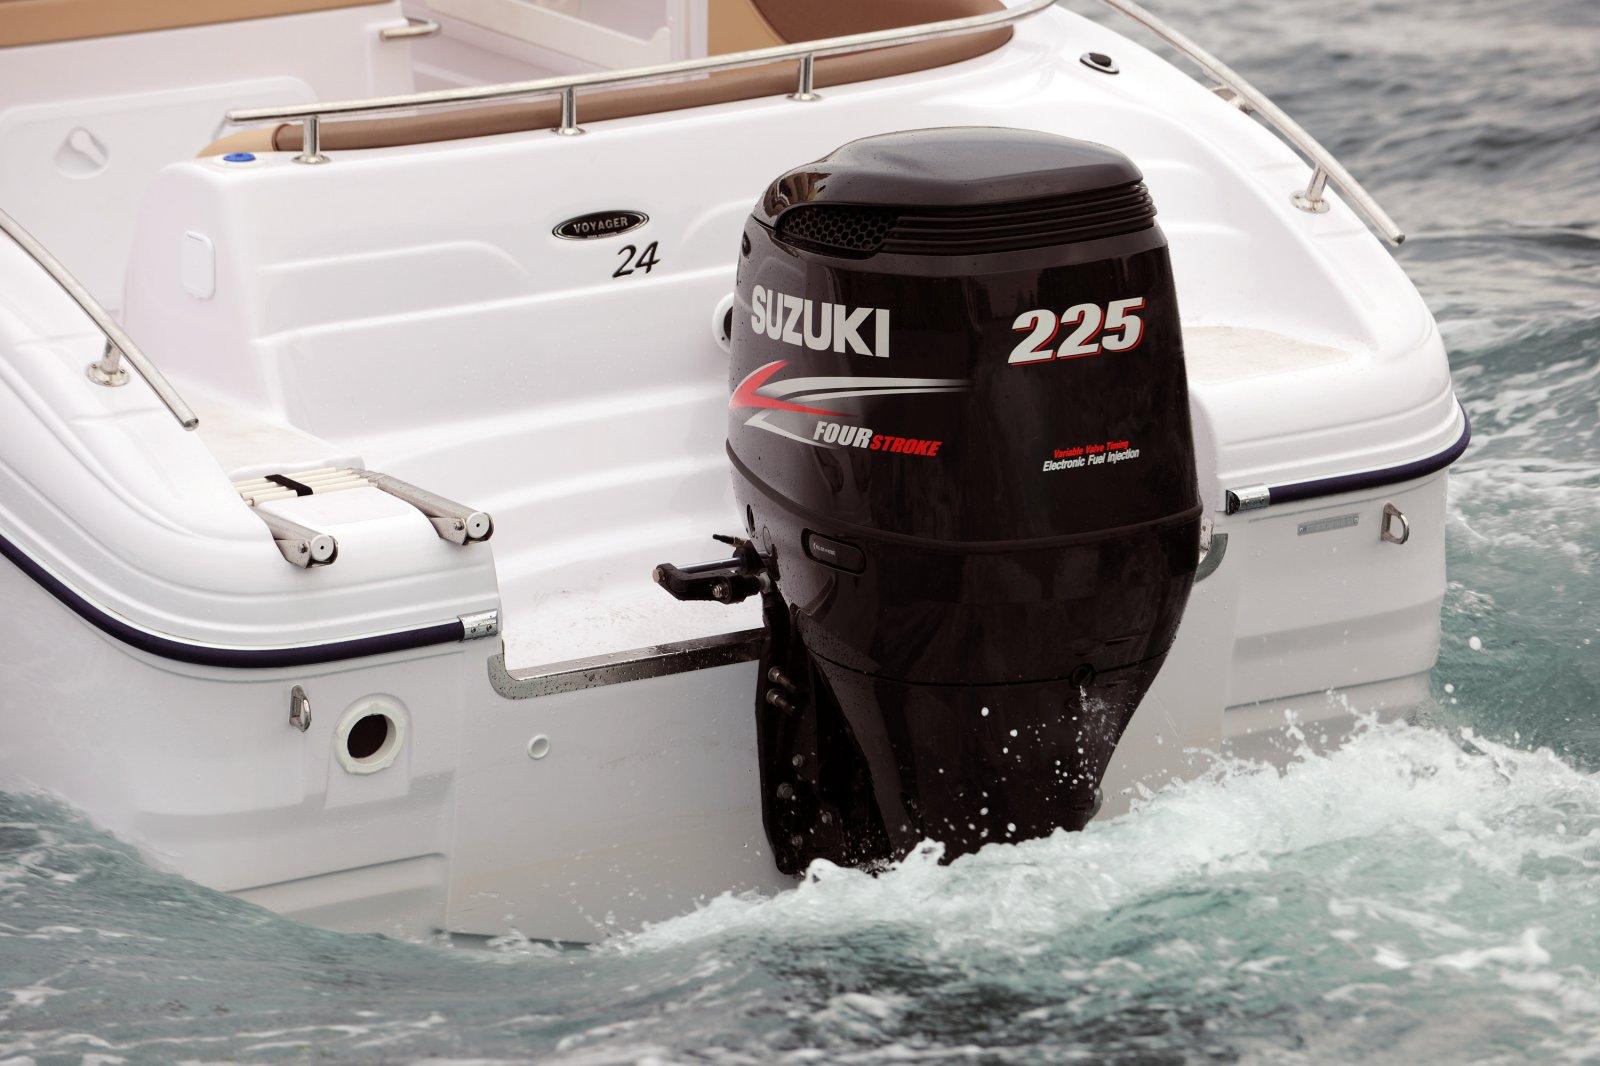 suzuki diagnostic для лодочных моторов